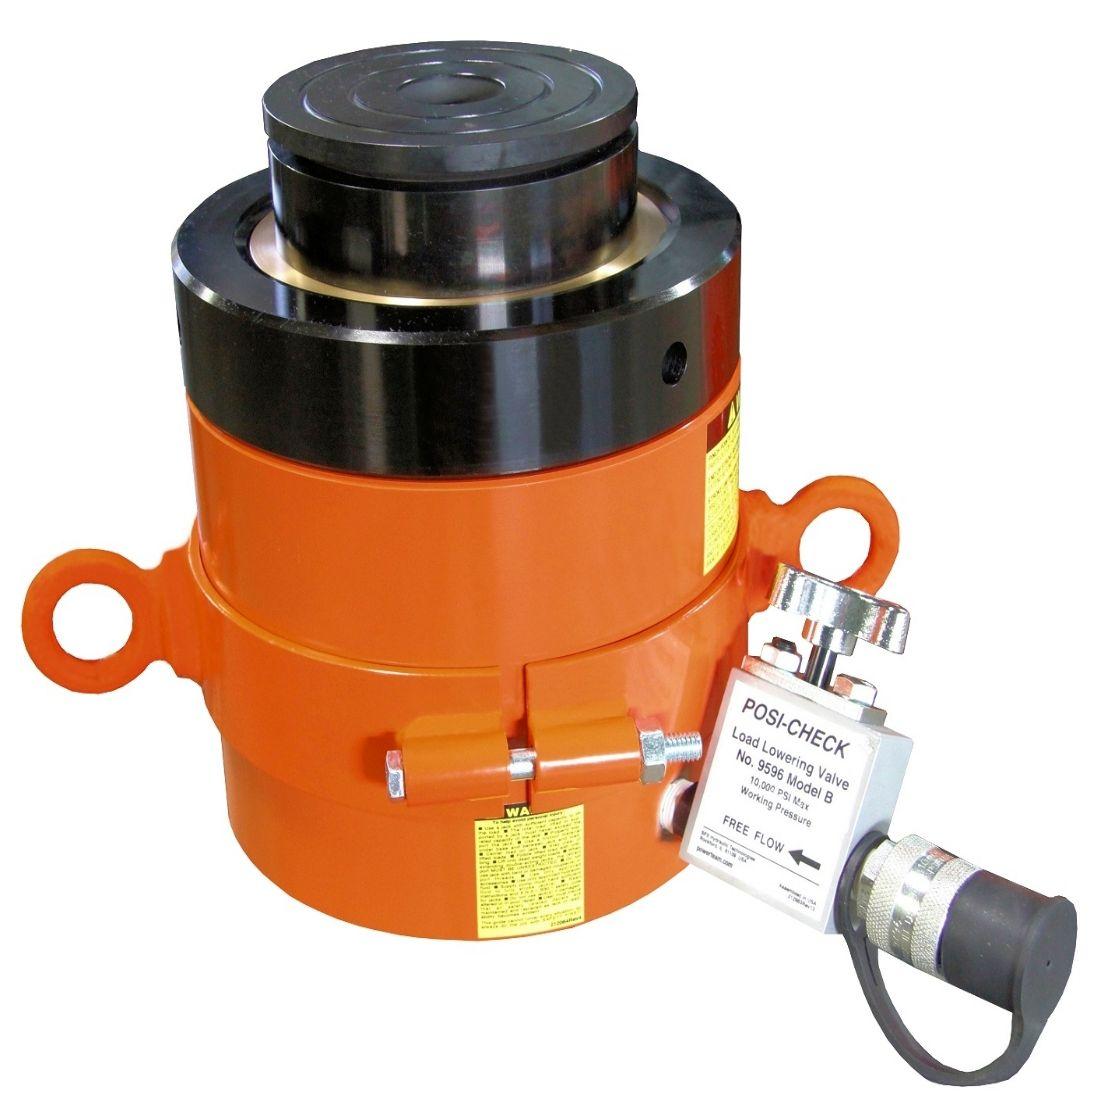 SPX Power Team EHN Hydraulic Nut SPX Power Team Corporation